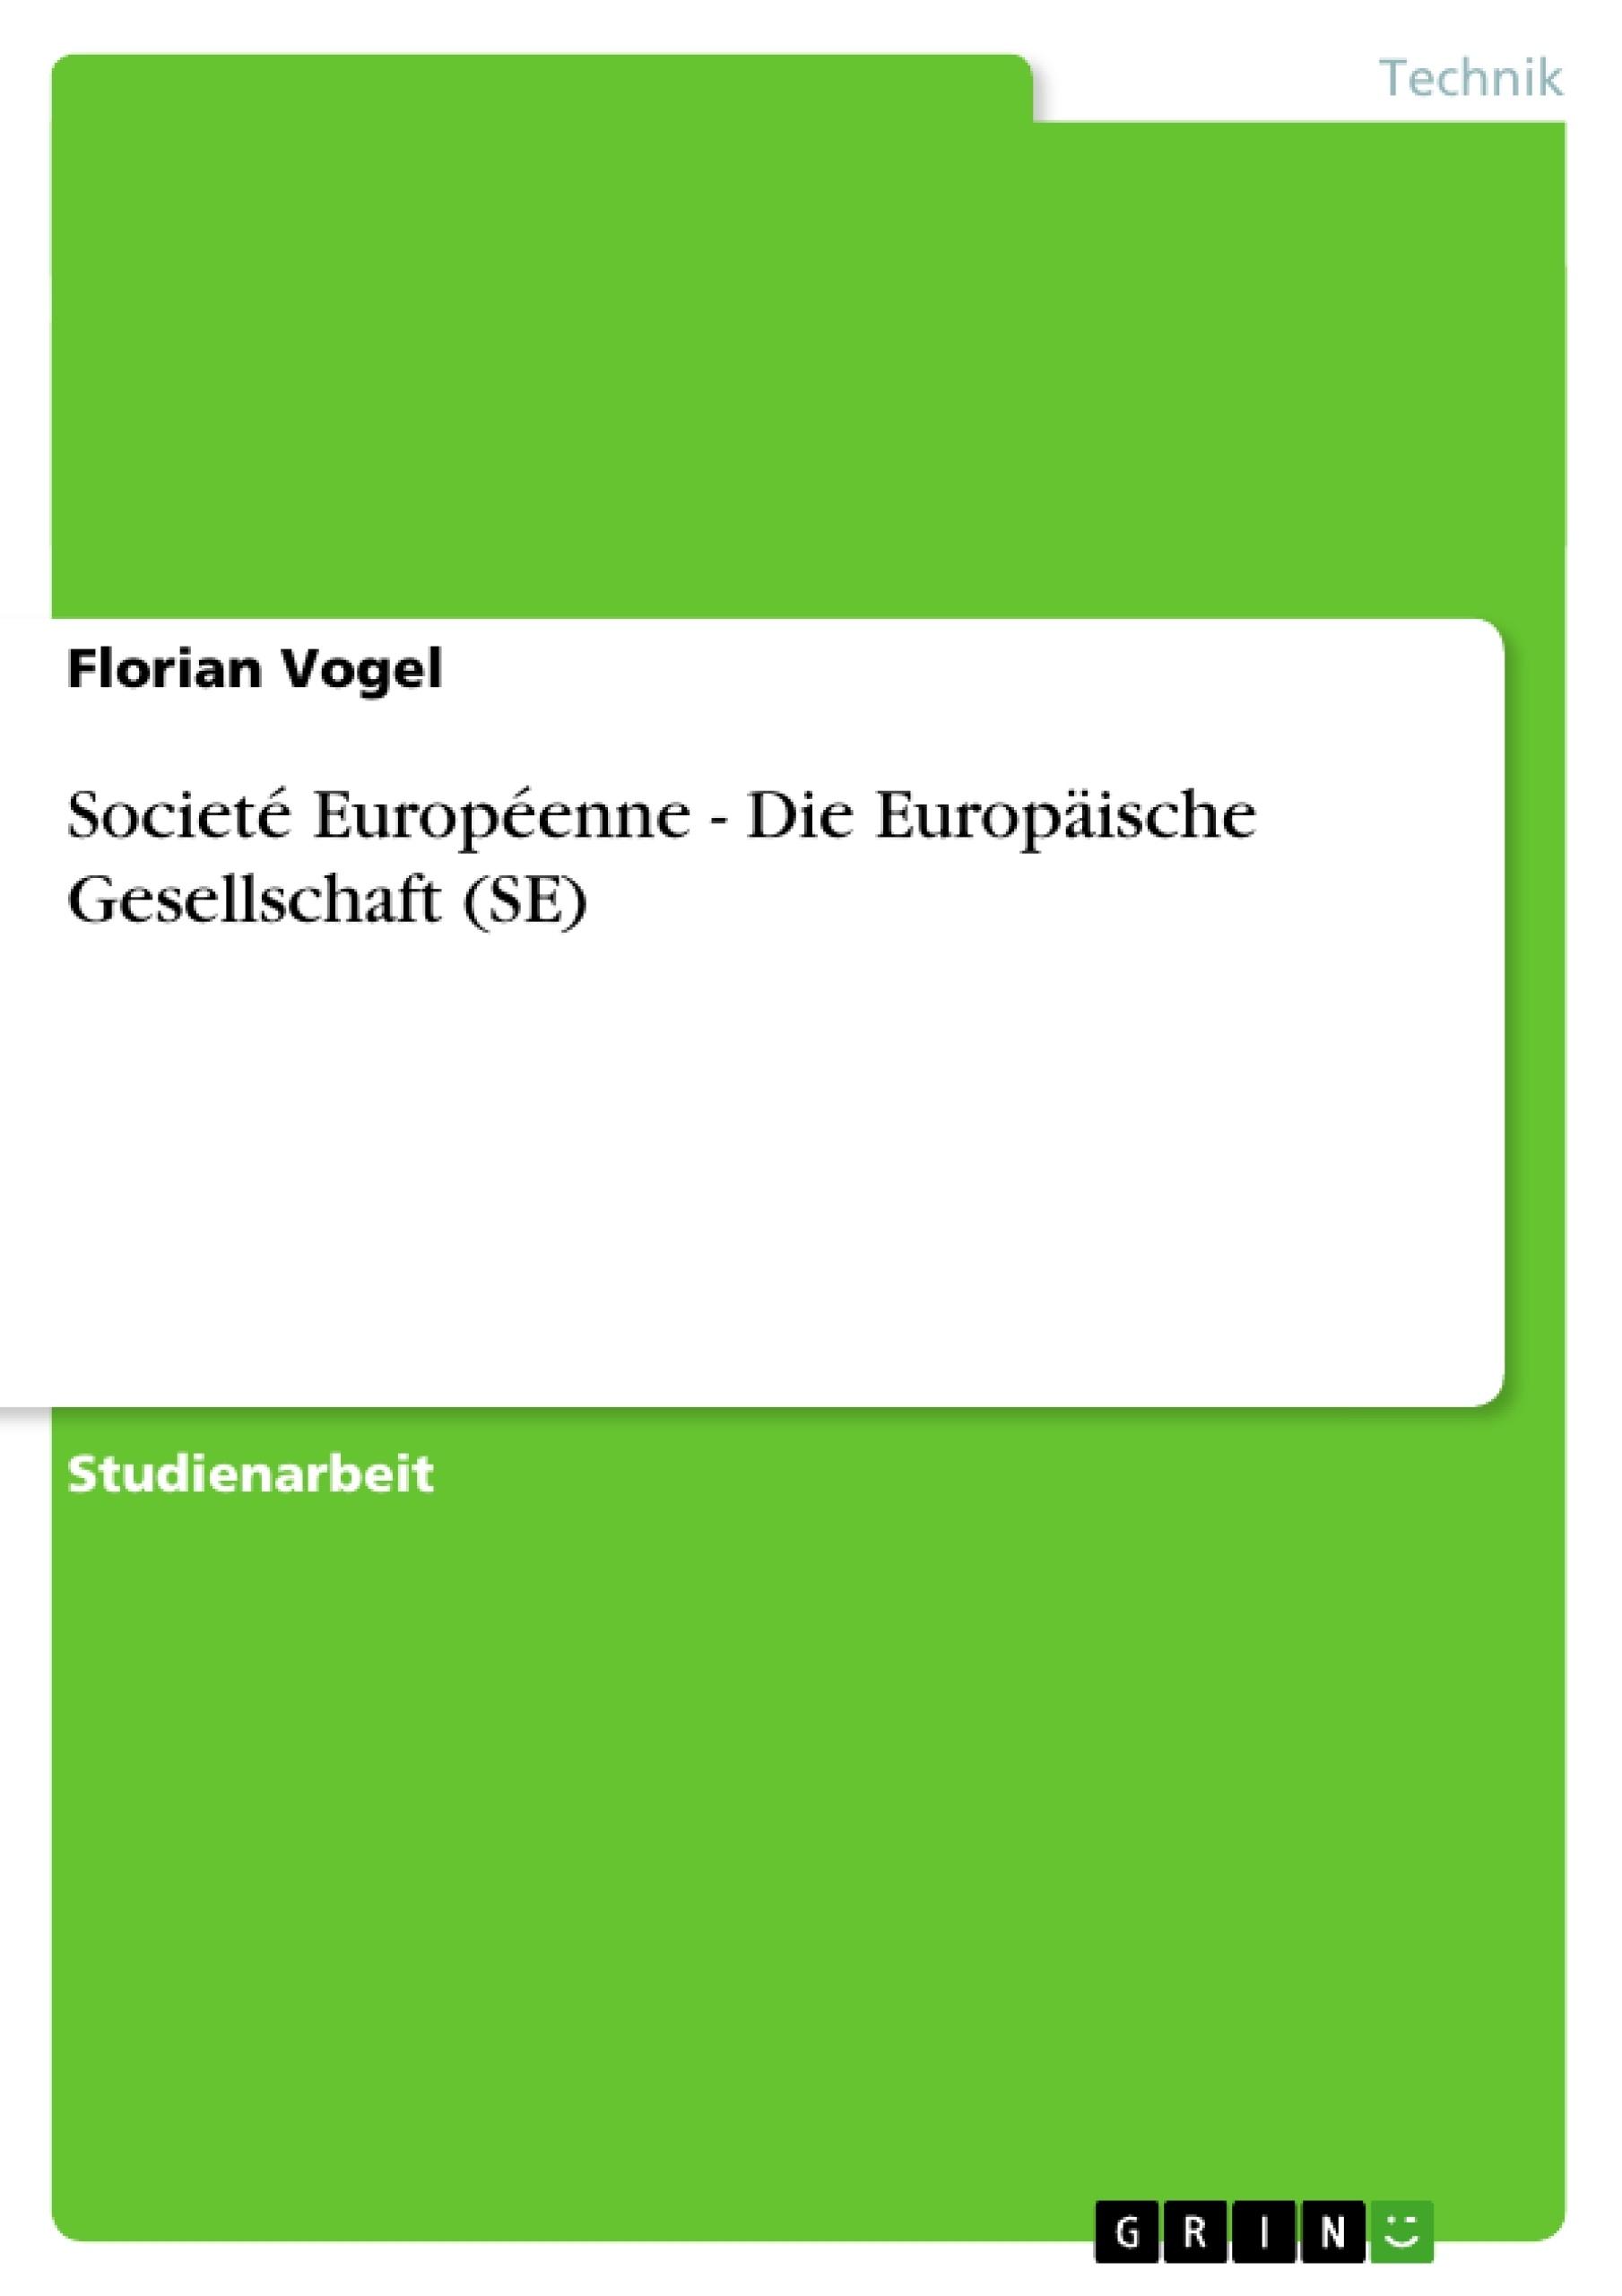 Titel: Societé Européenne - Die Europäische Gesellschaft (SE)